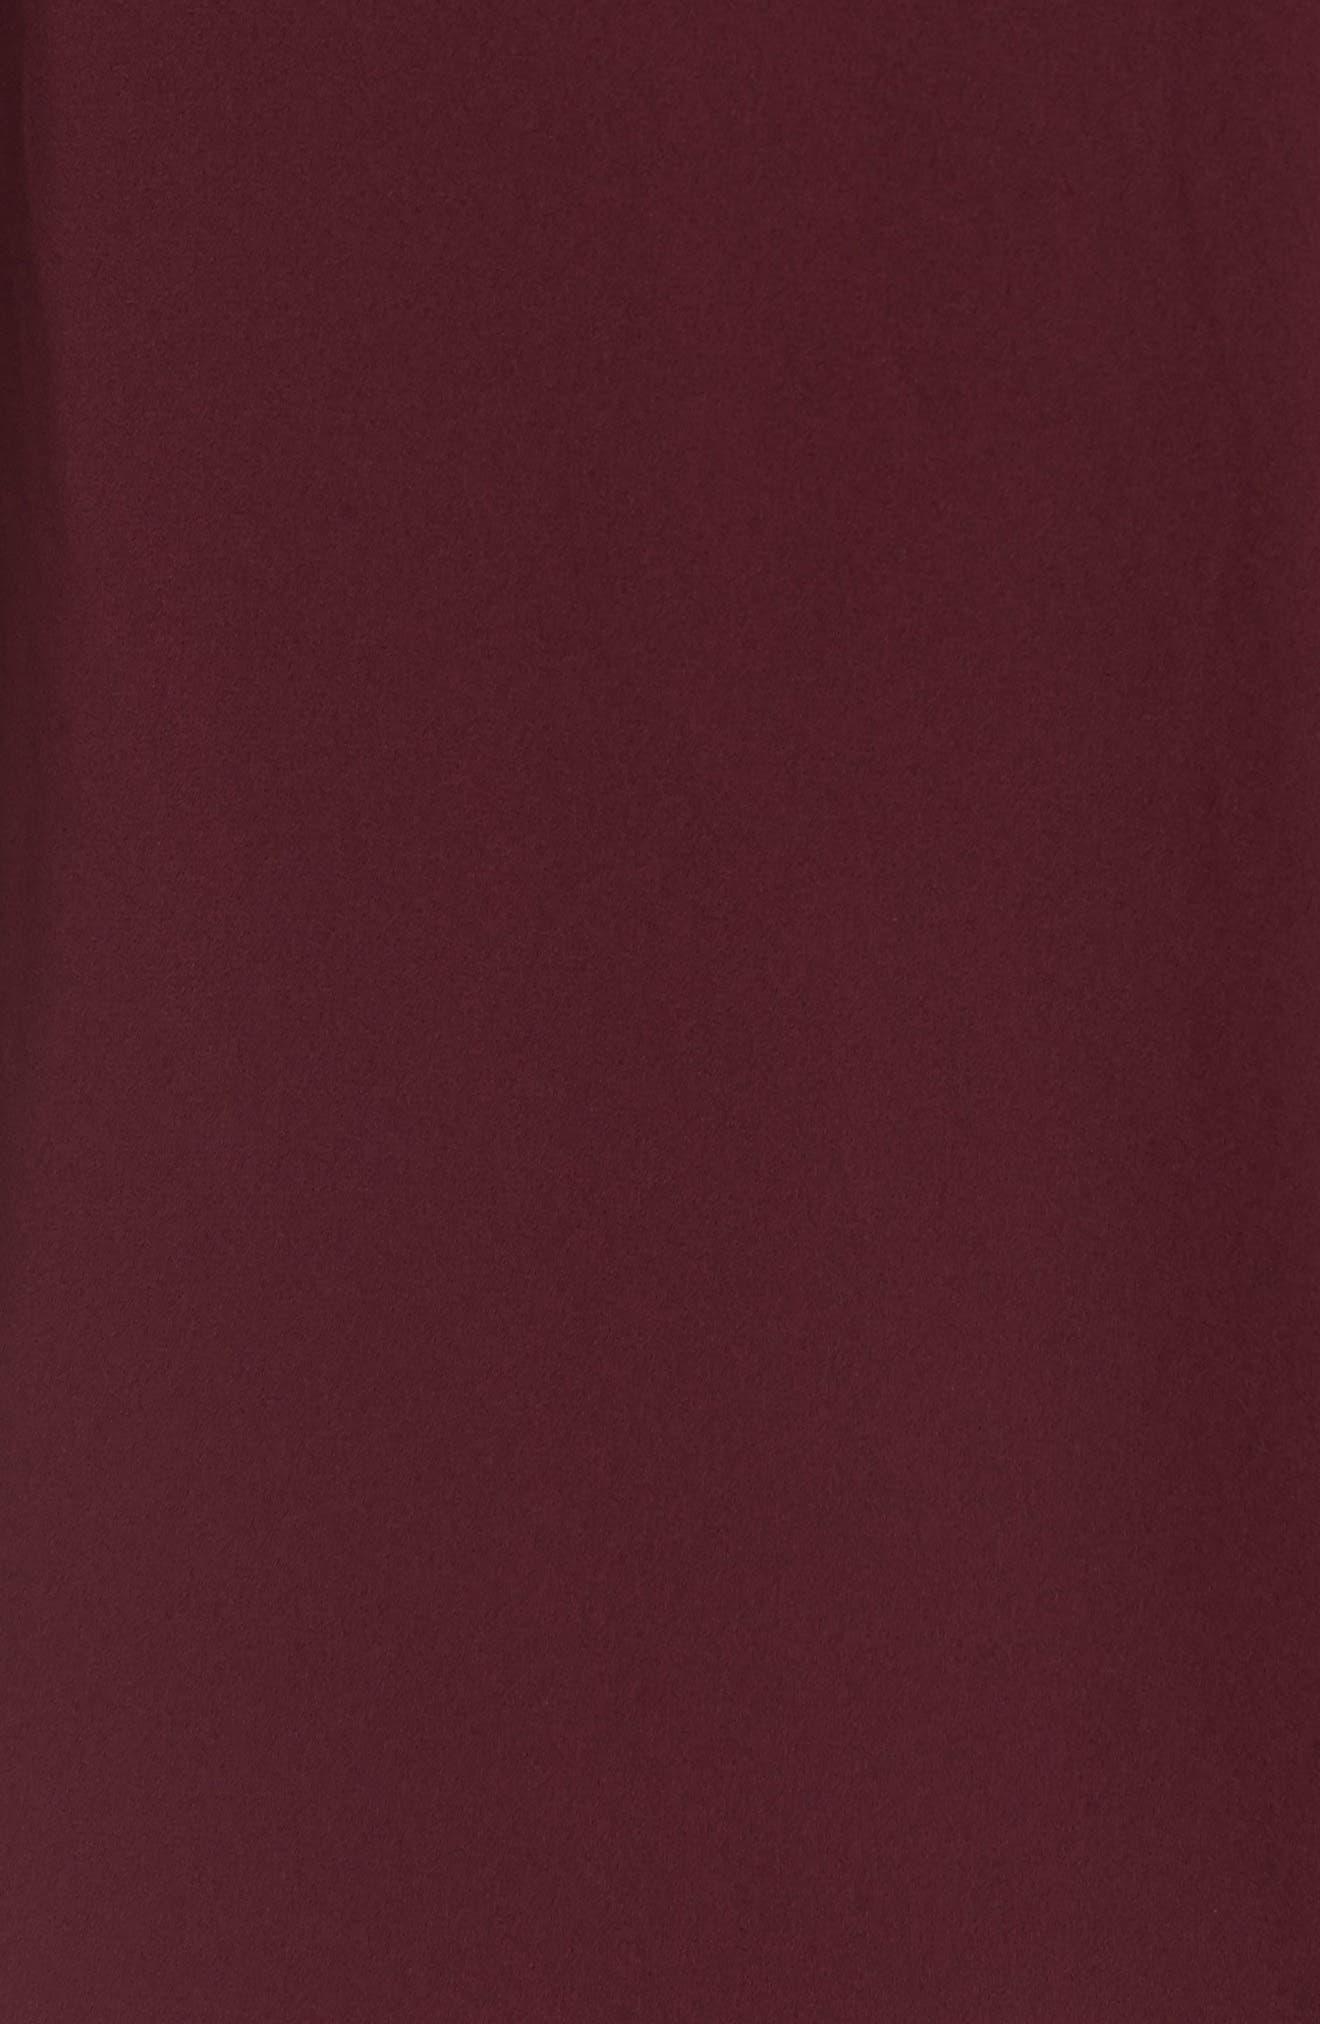 Elly Wrap Dress,                             Alternate thumbnail 70, color,